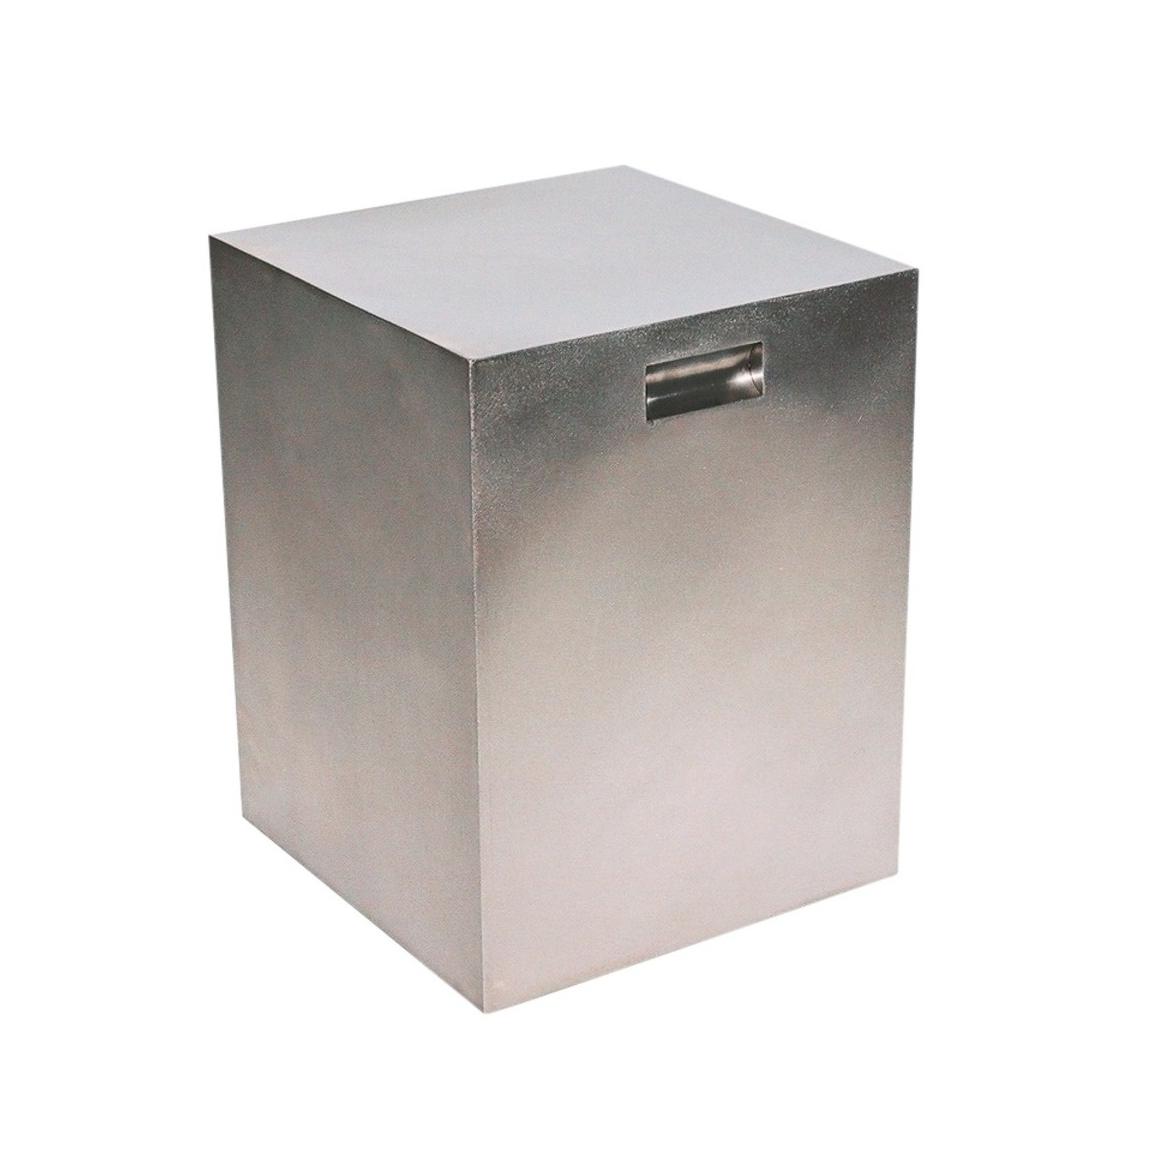 512e319bb5a3d1a8-handle-table-by-darren-vigilant-side-tables-industrial-modern.jpg